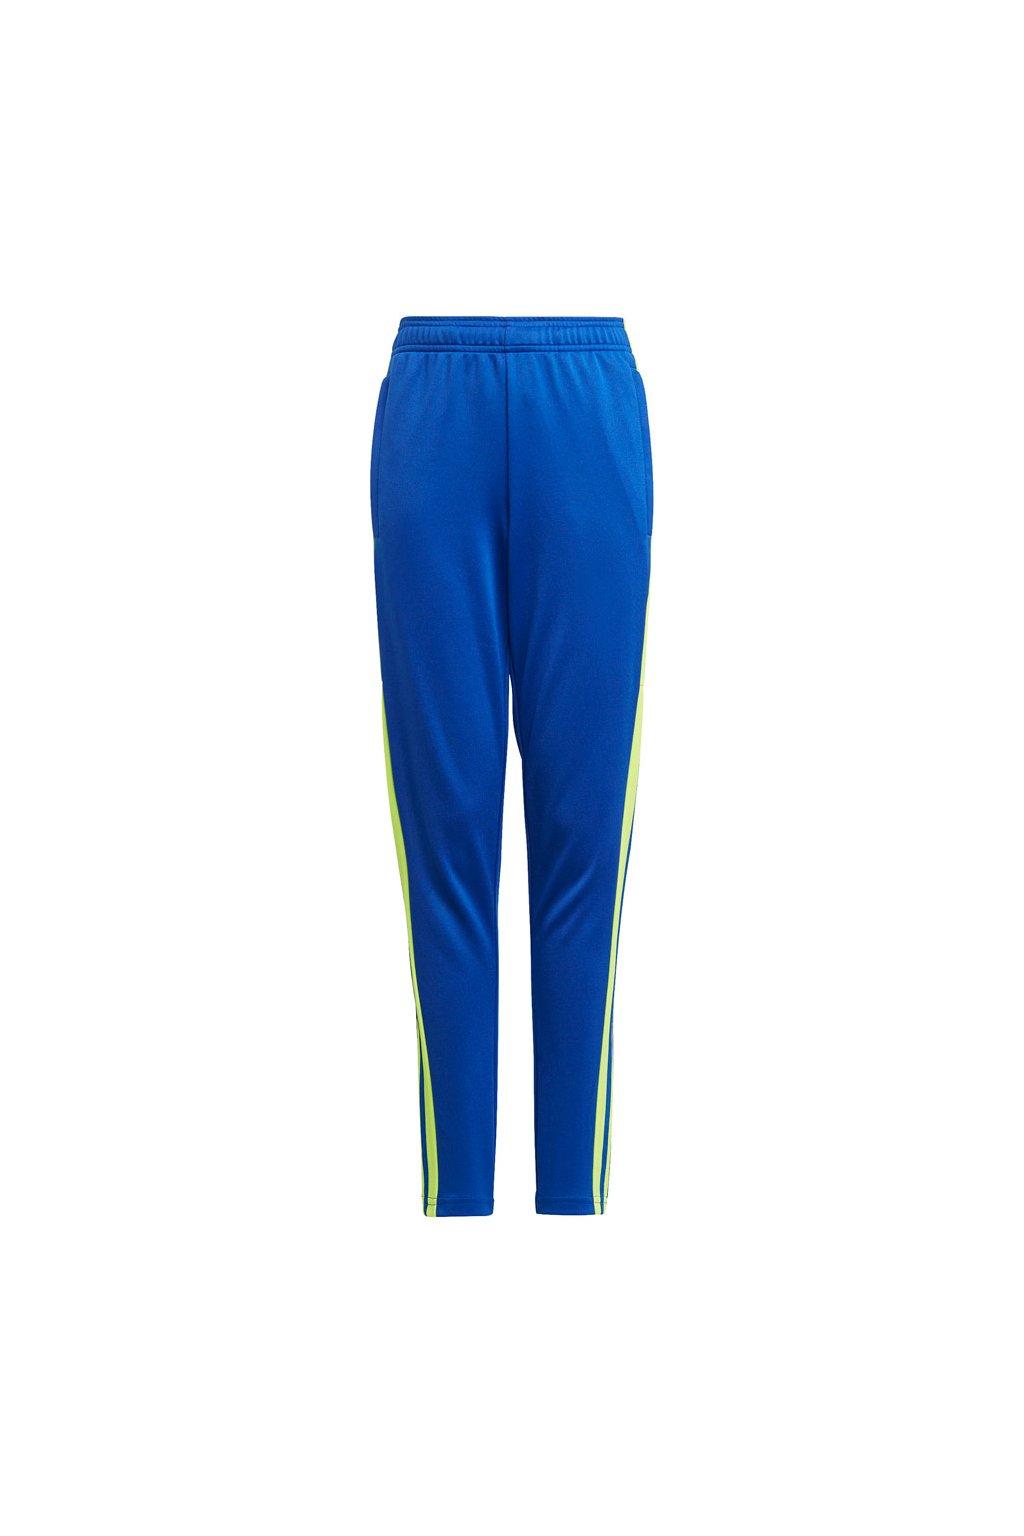 Chlapčenské tepláky adidas Squadra 21 Training Pant Youth modré-zelené GP6449